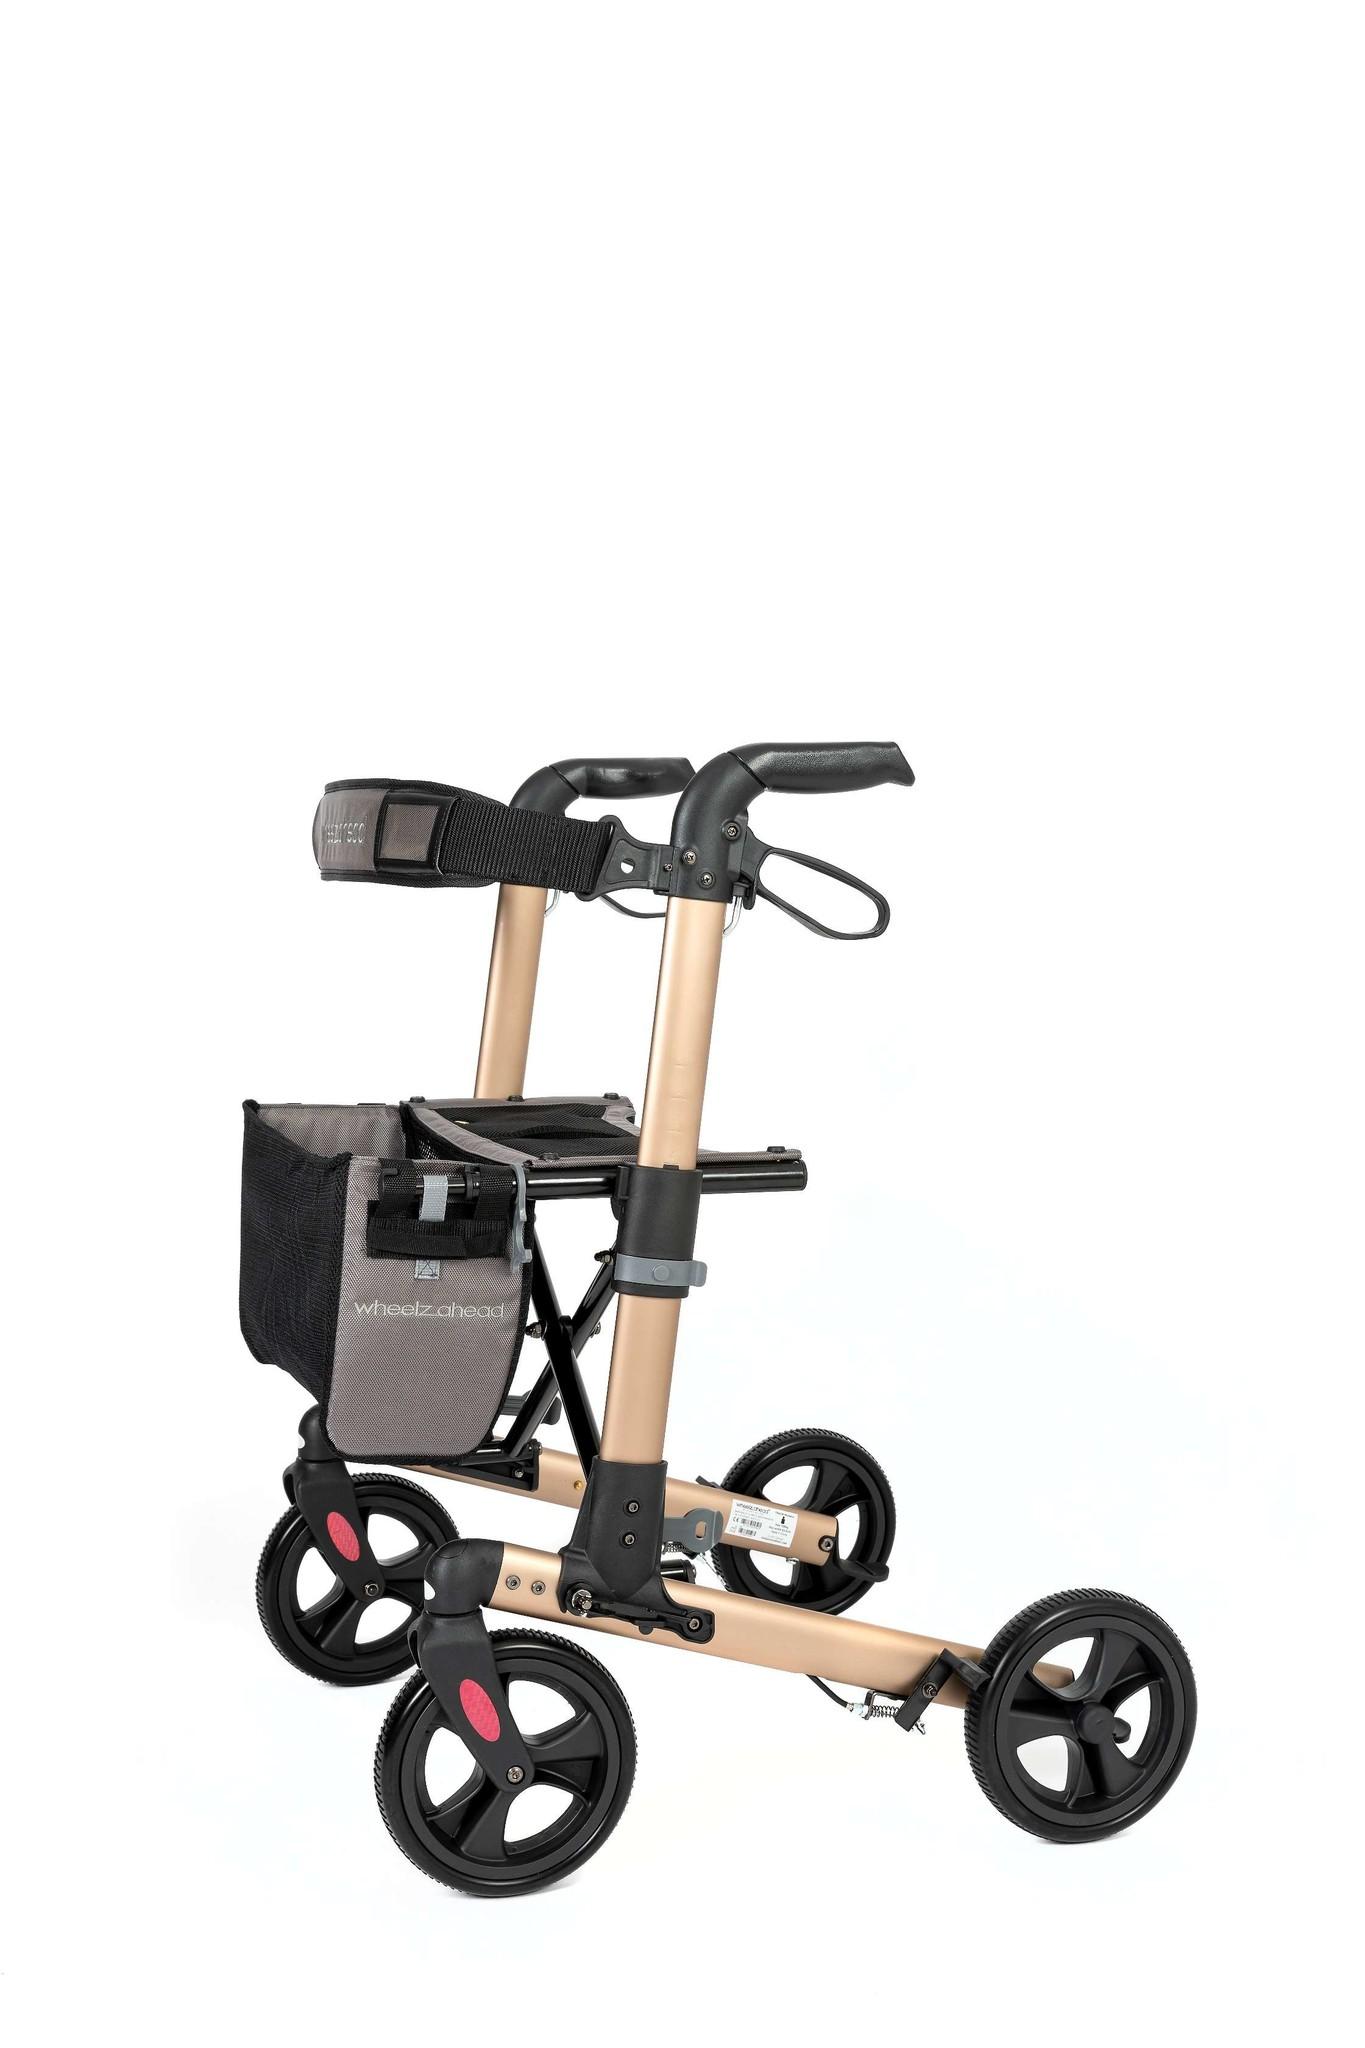 Wheelzahead Rollator TRACK Champagne